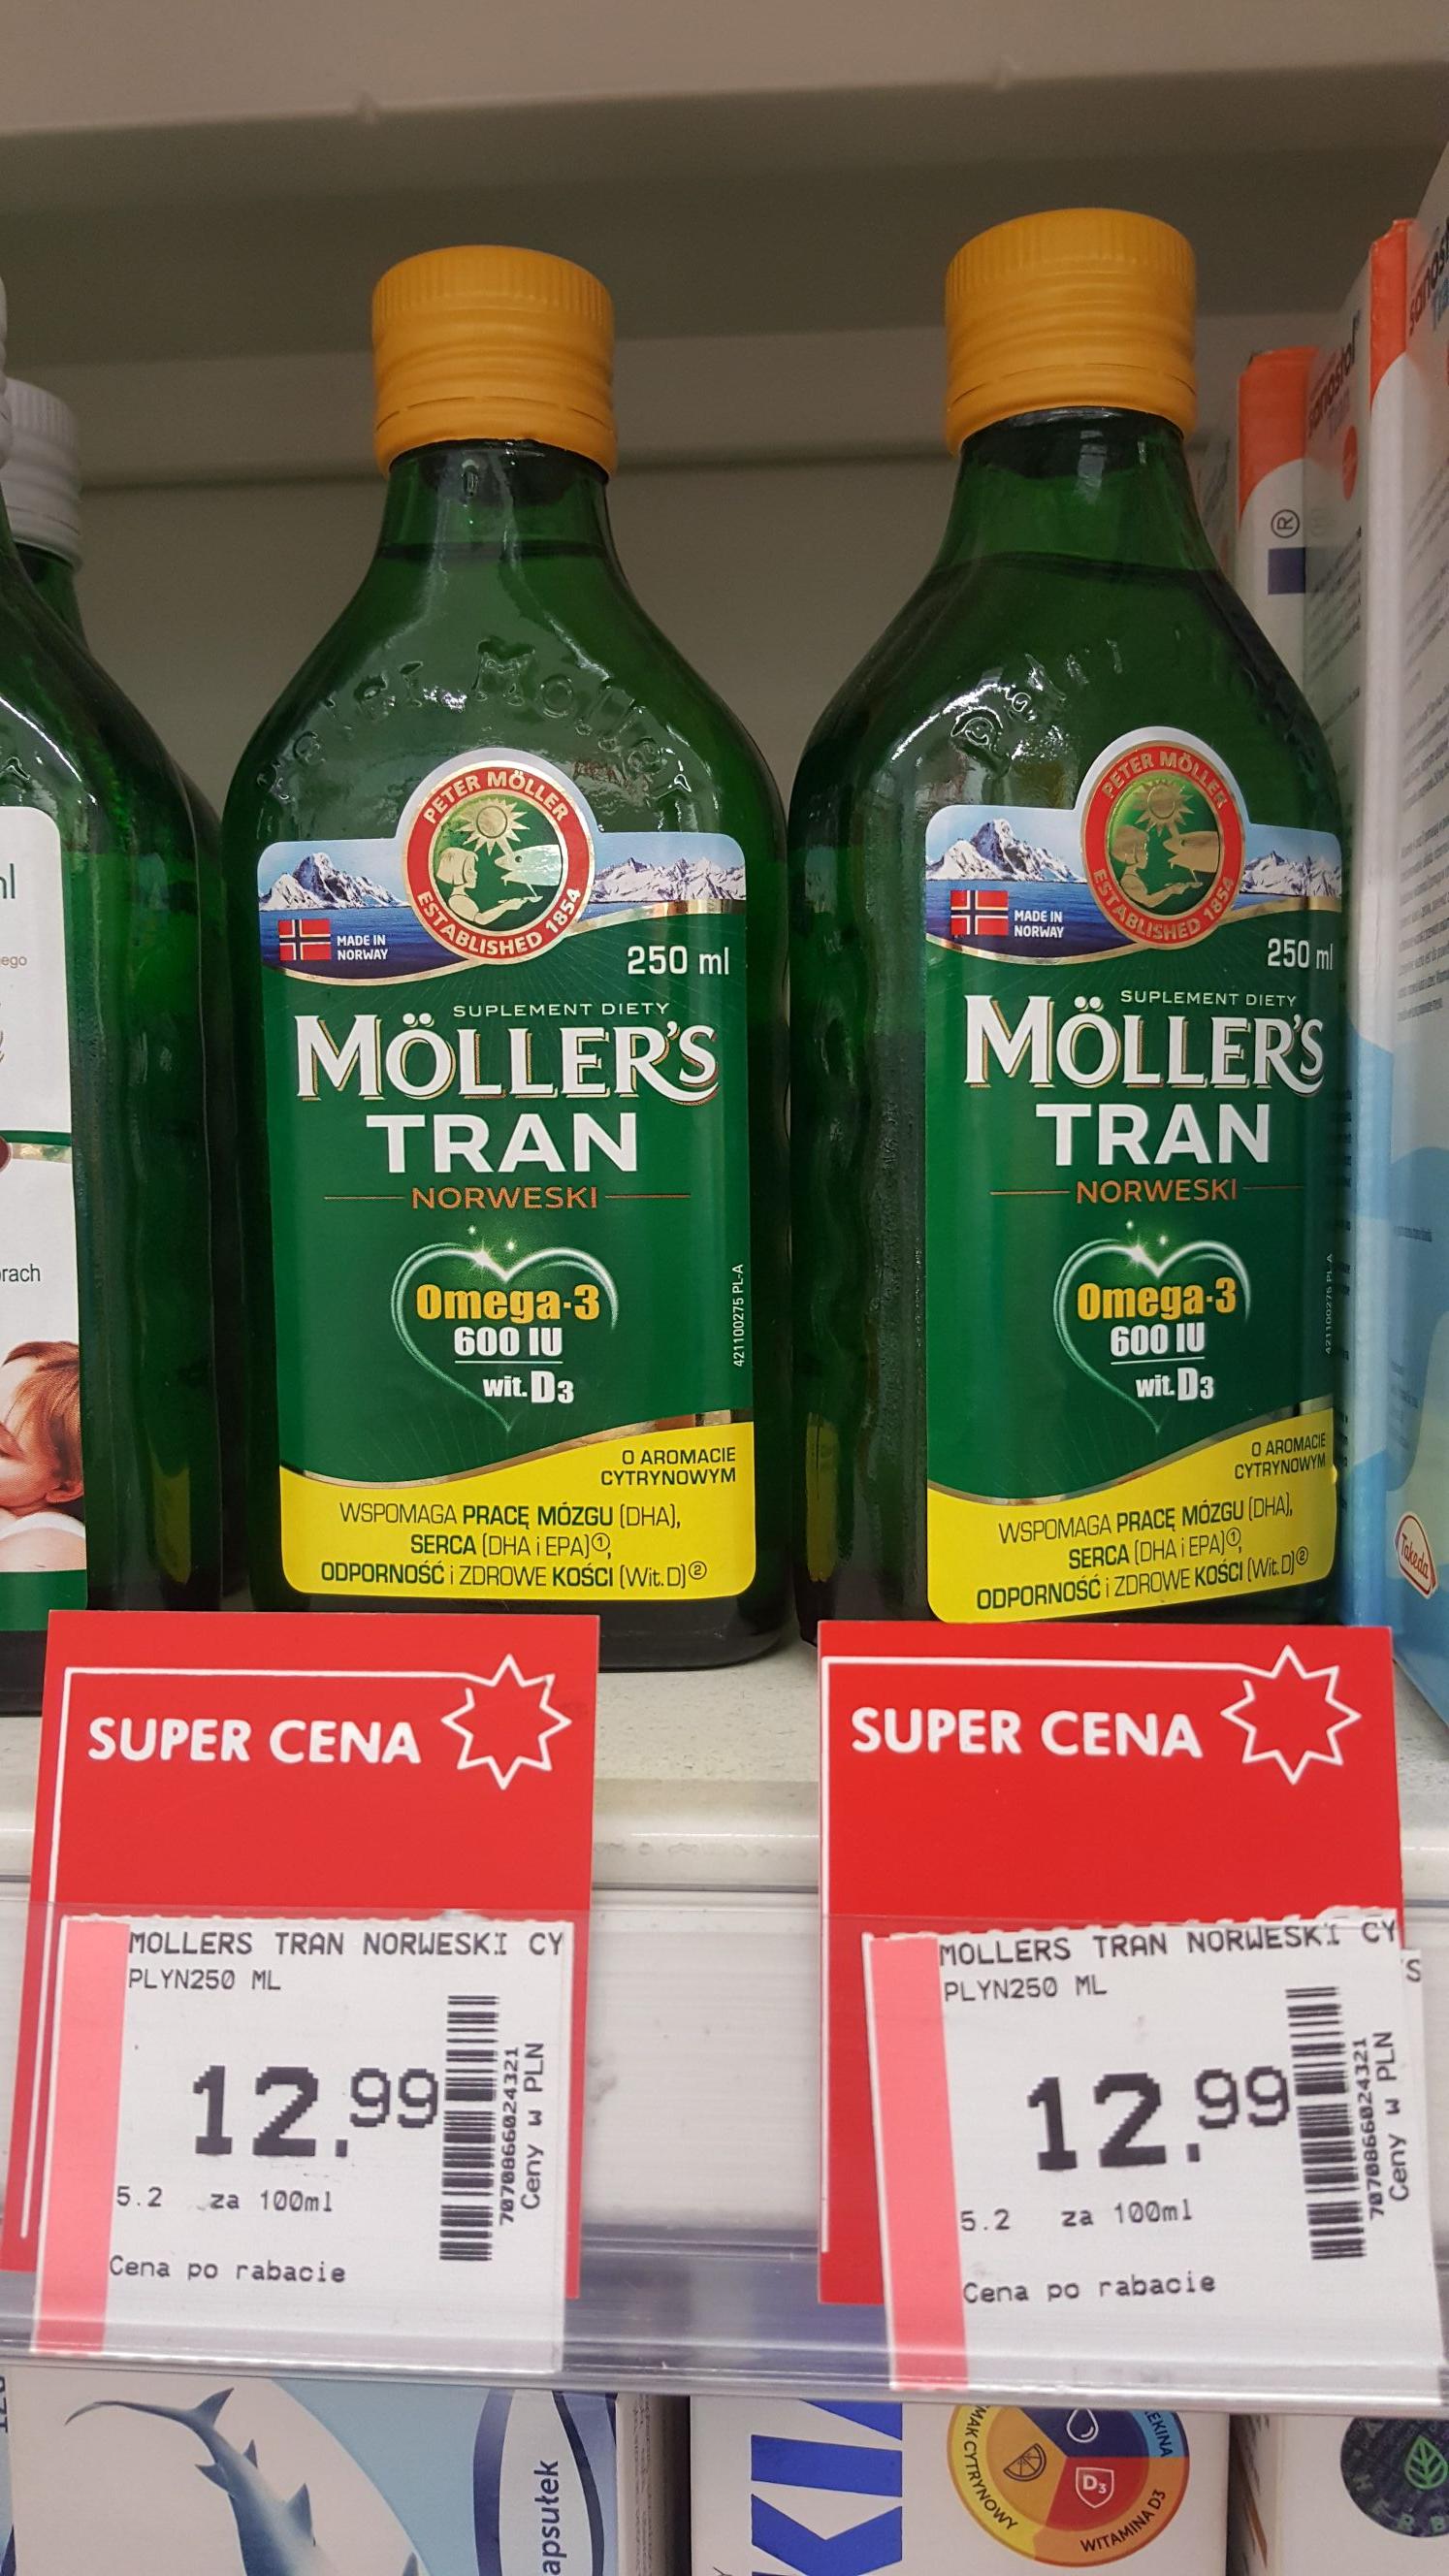 Mollers tran norweski 12.99zł w superpharm